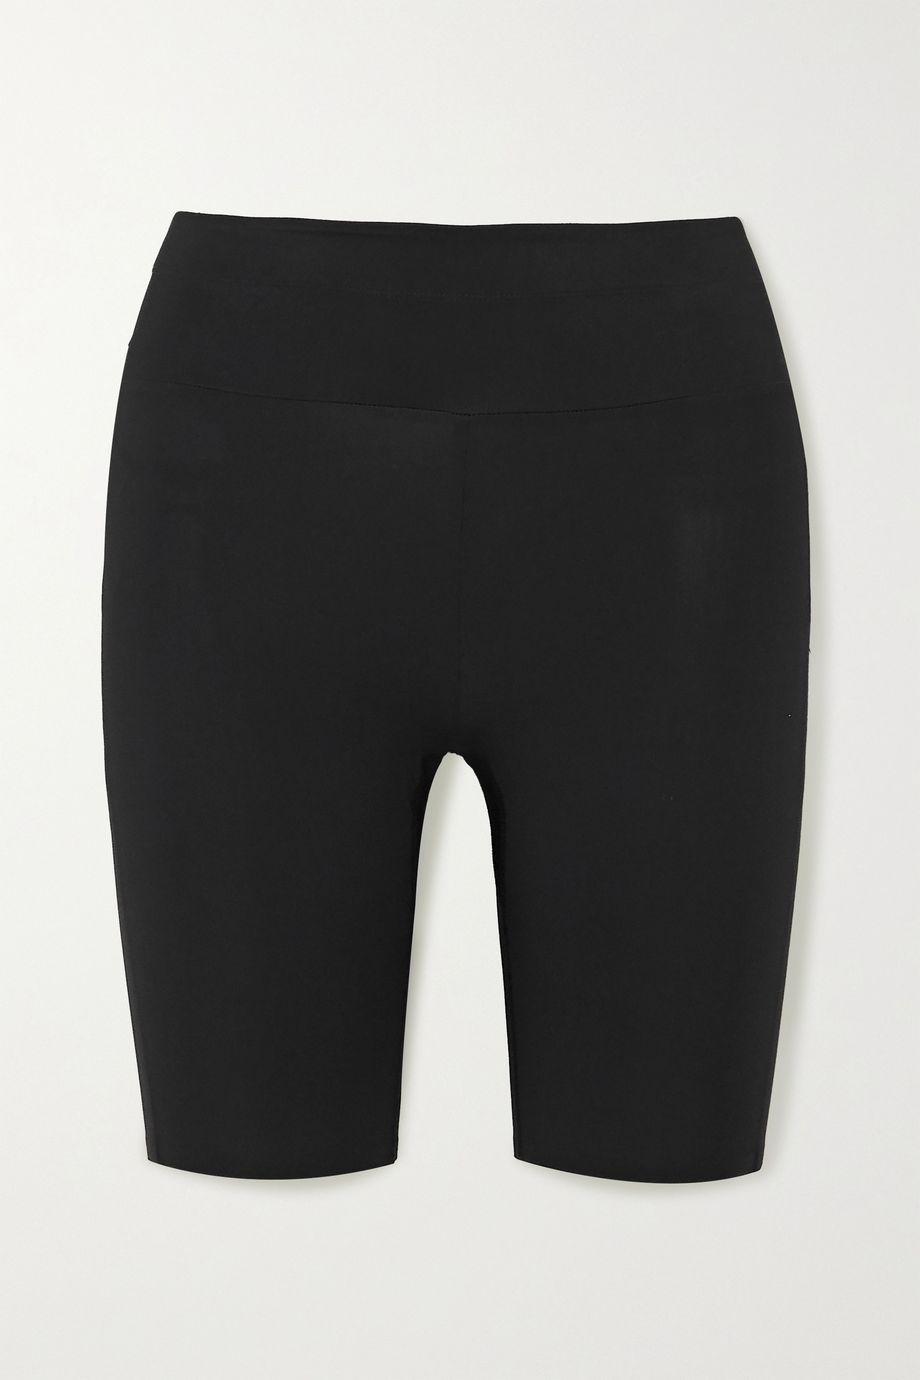 Vaara Millie stretch shorts